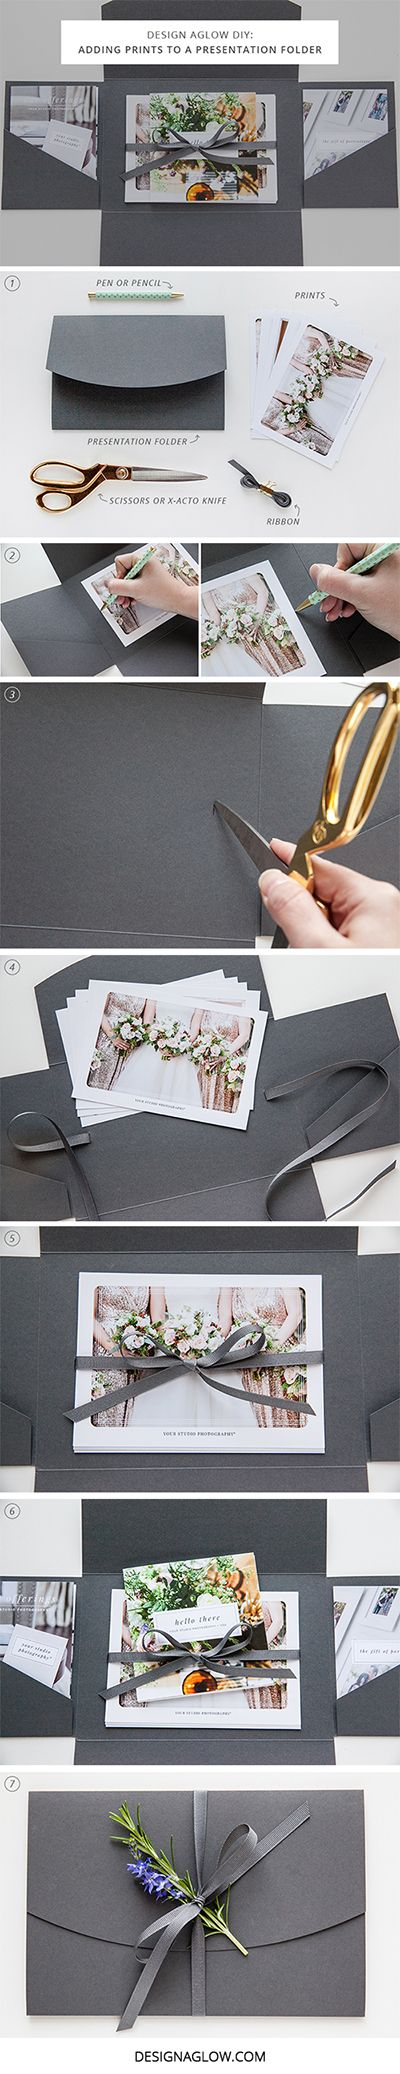 Adding-Prints-to-a-Presentation-Folder.jpg